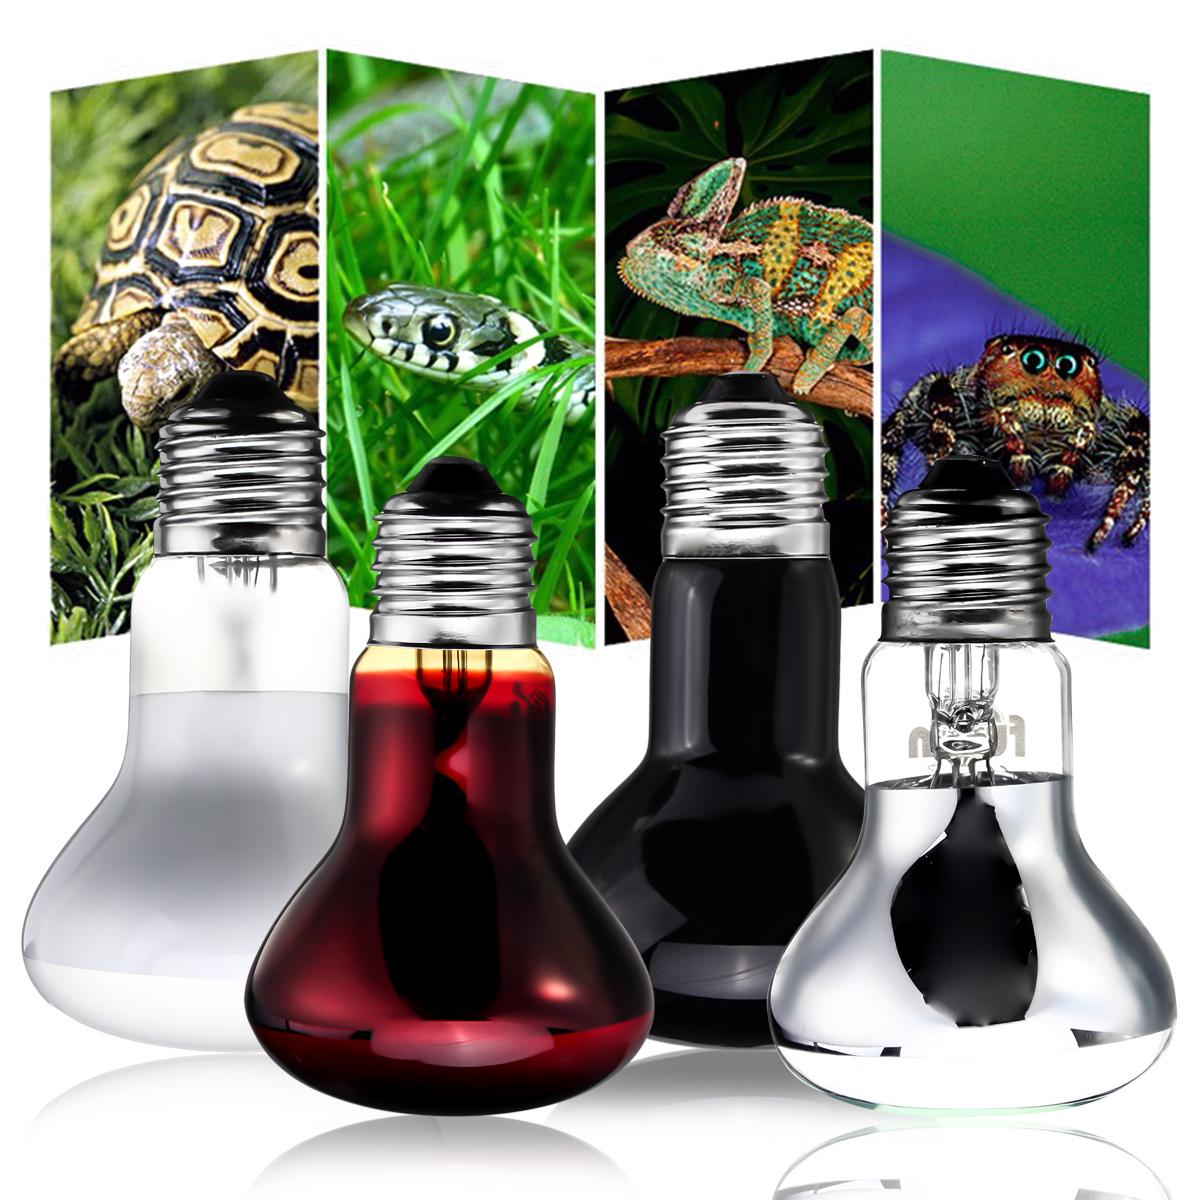 E27 R63 25W 50W 75W 100W Red Nightlight Heater Reptile Light Lamp AC220-240V